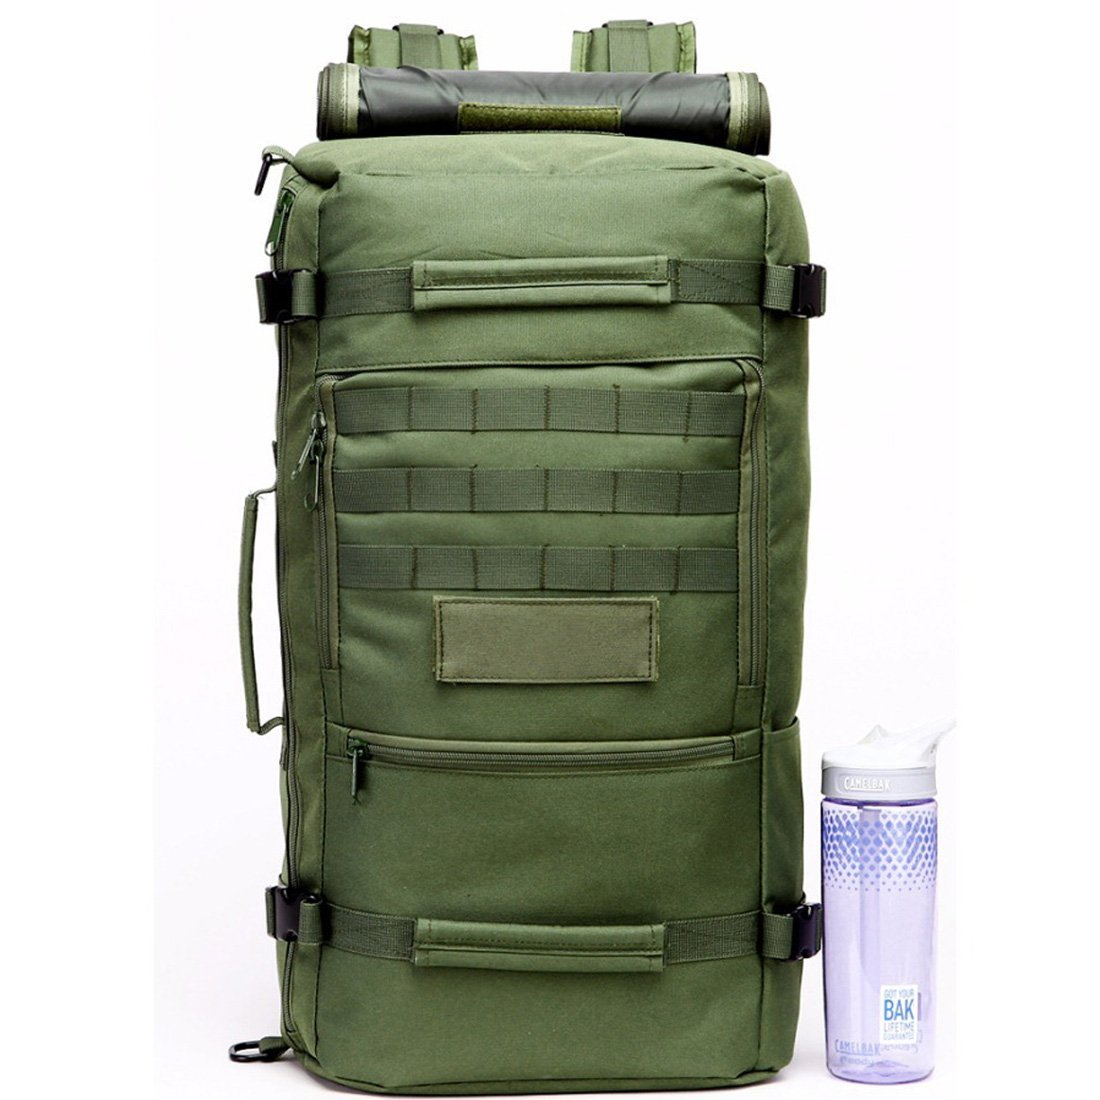 wankerl 50L multifunci/ón 3/en 1/Militar Exterior T/áctica De Camping Mochila De Senderismo Bolso de mano bolsa de hombro mochila